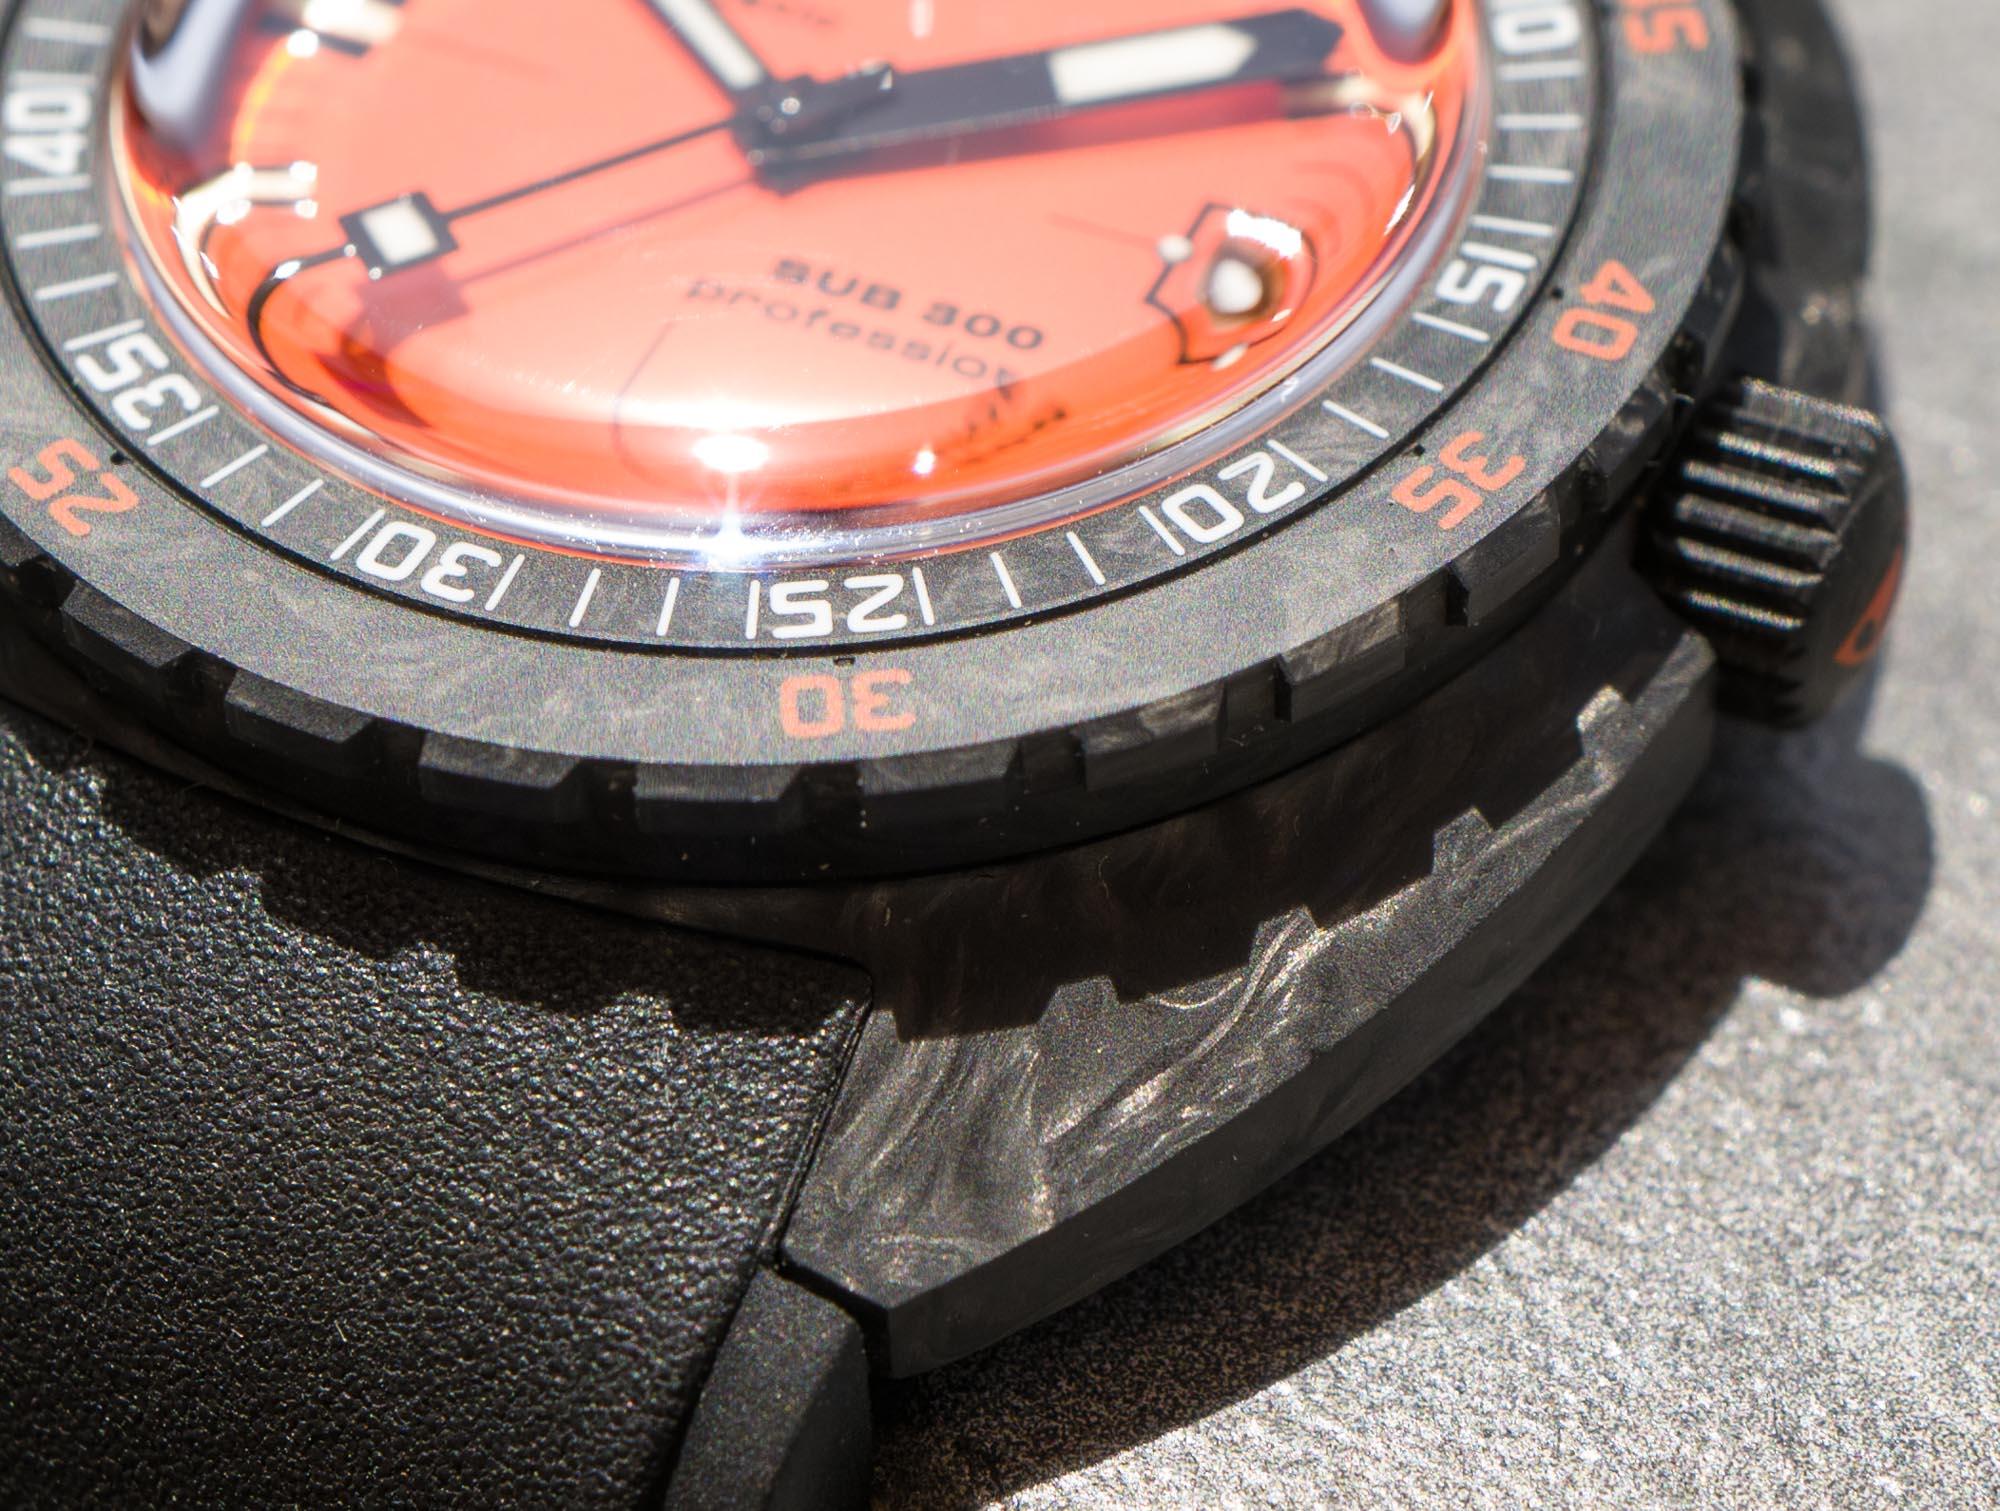 Часы для дайвинга: Doxa Sub 300 Carbon